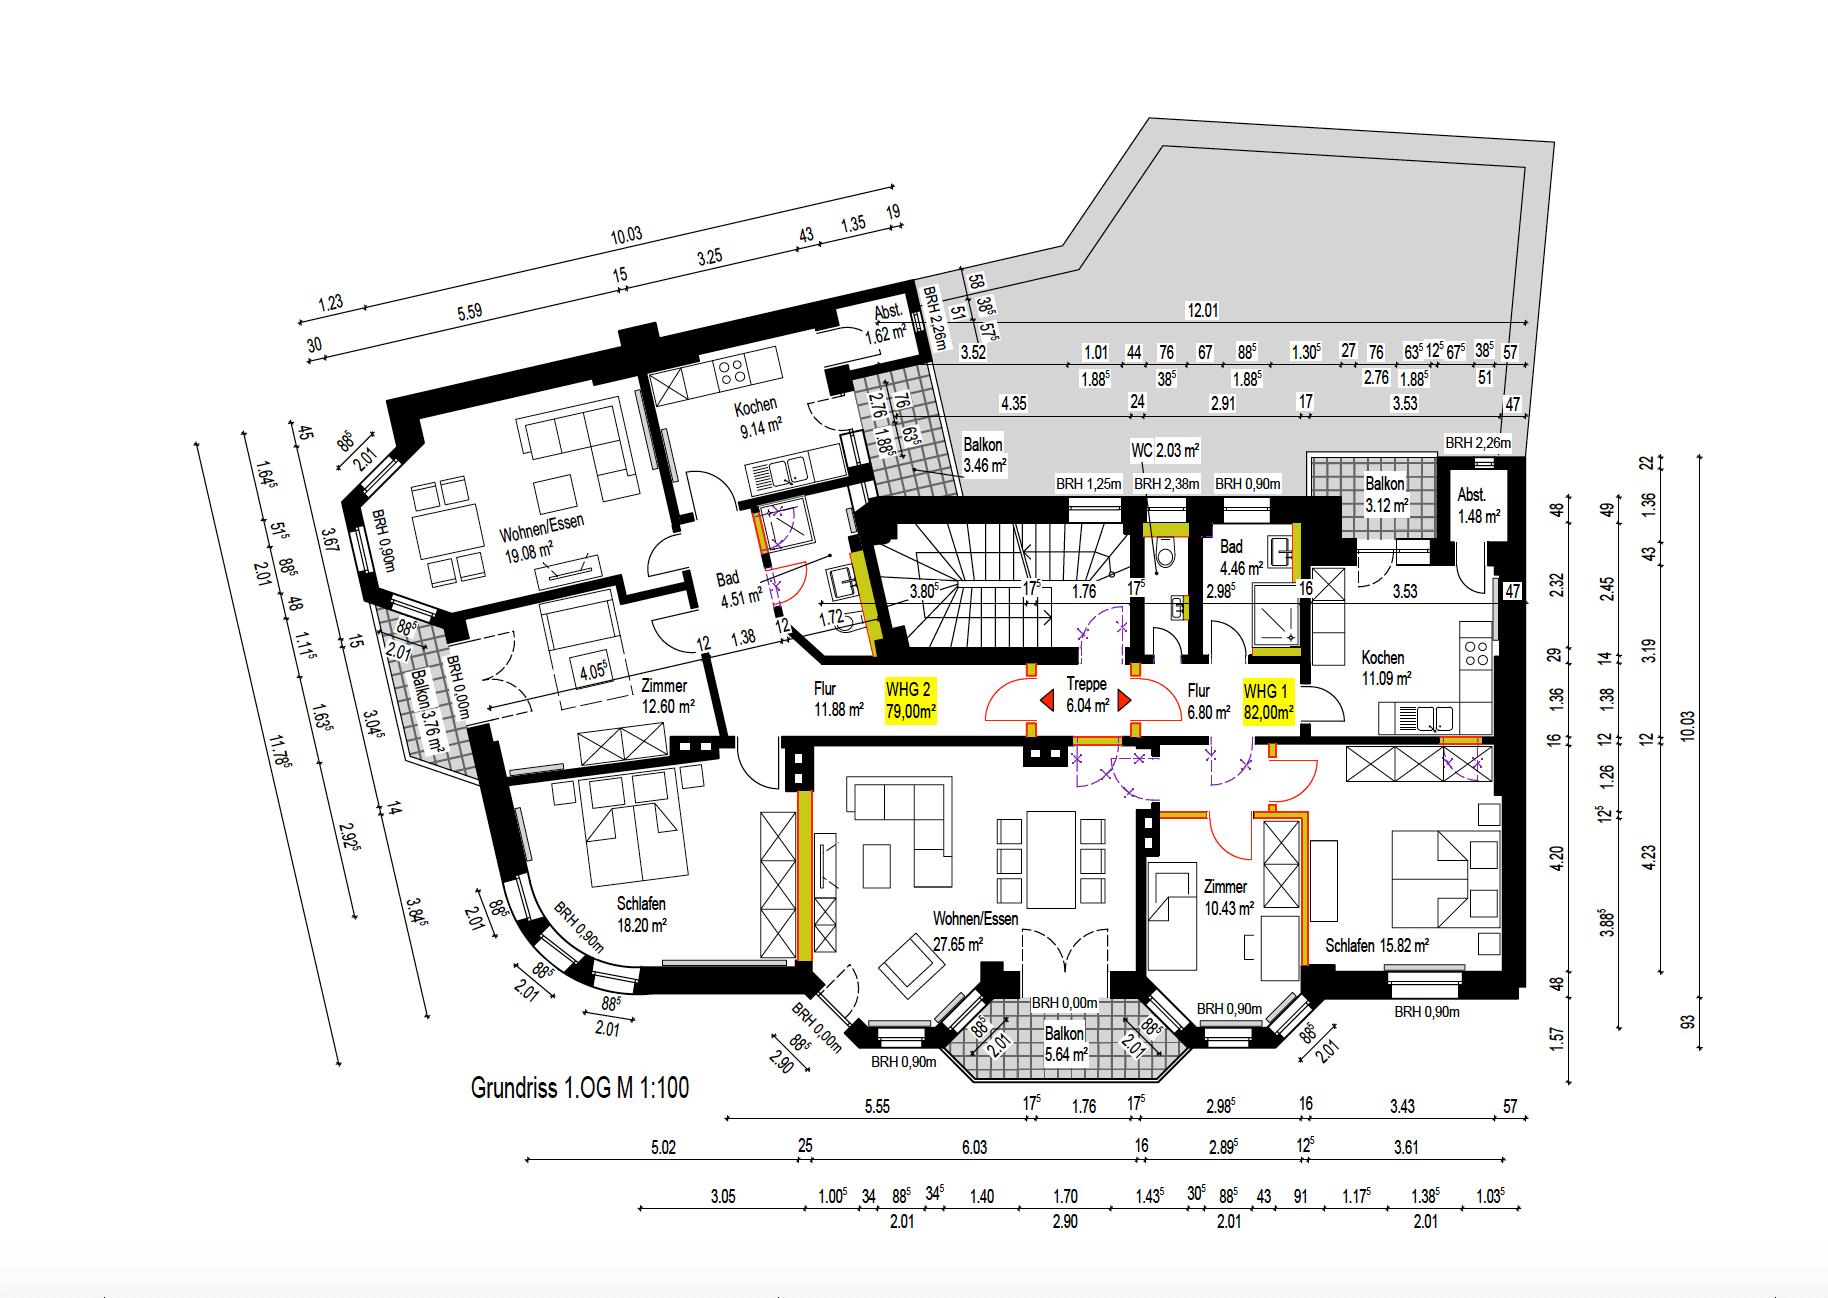 Neuer Grundriss 1OG